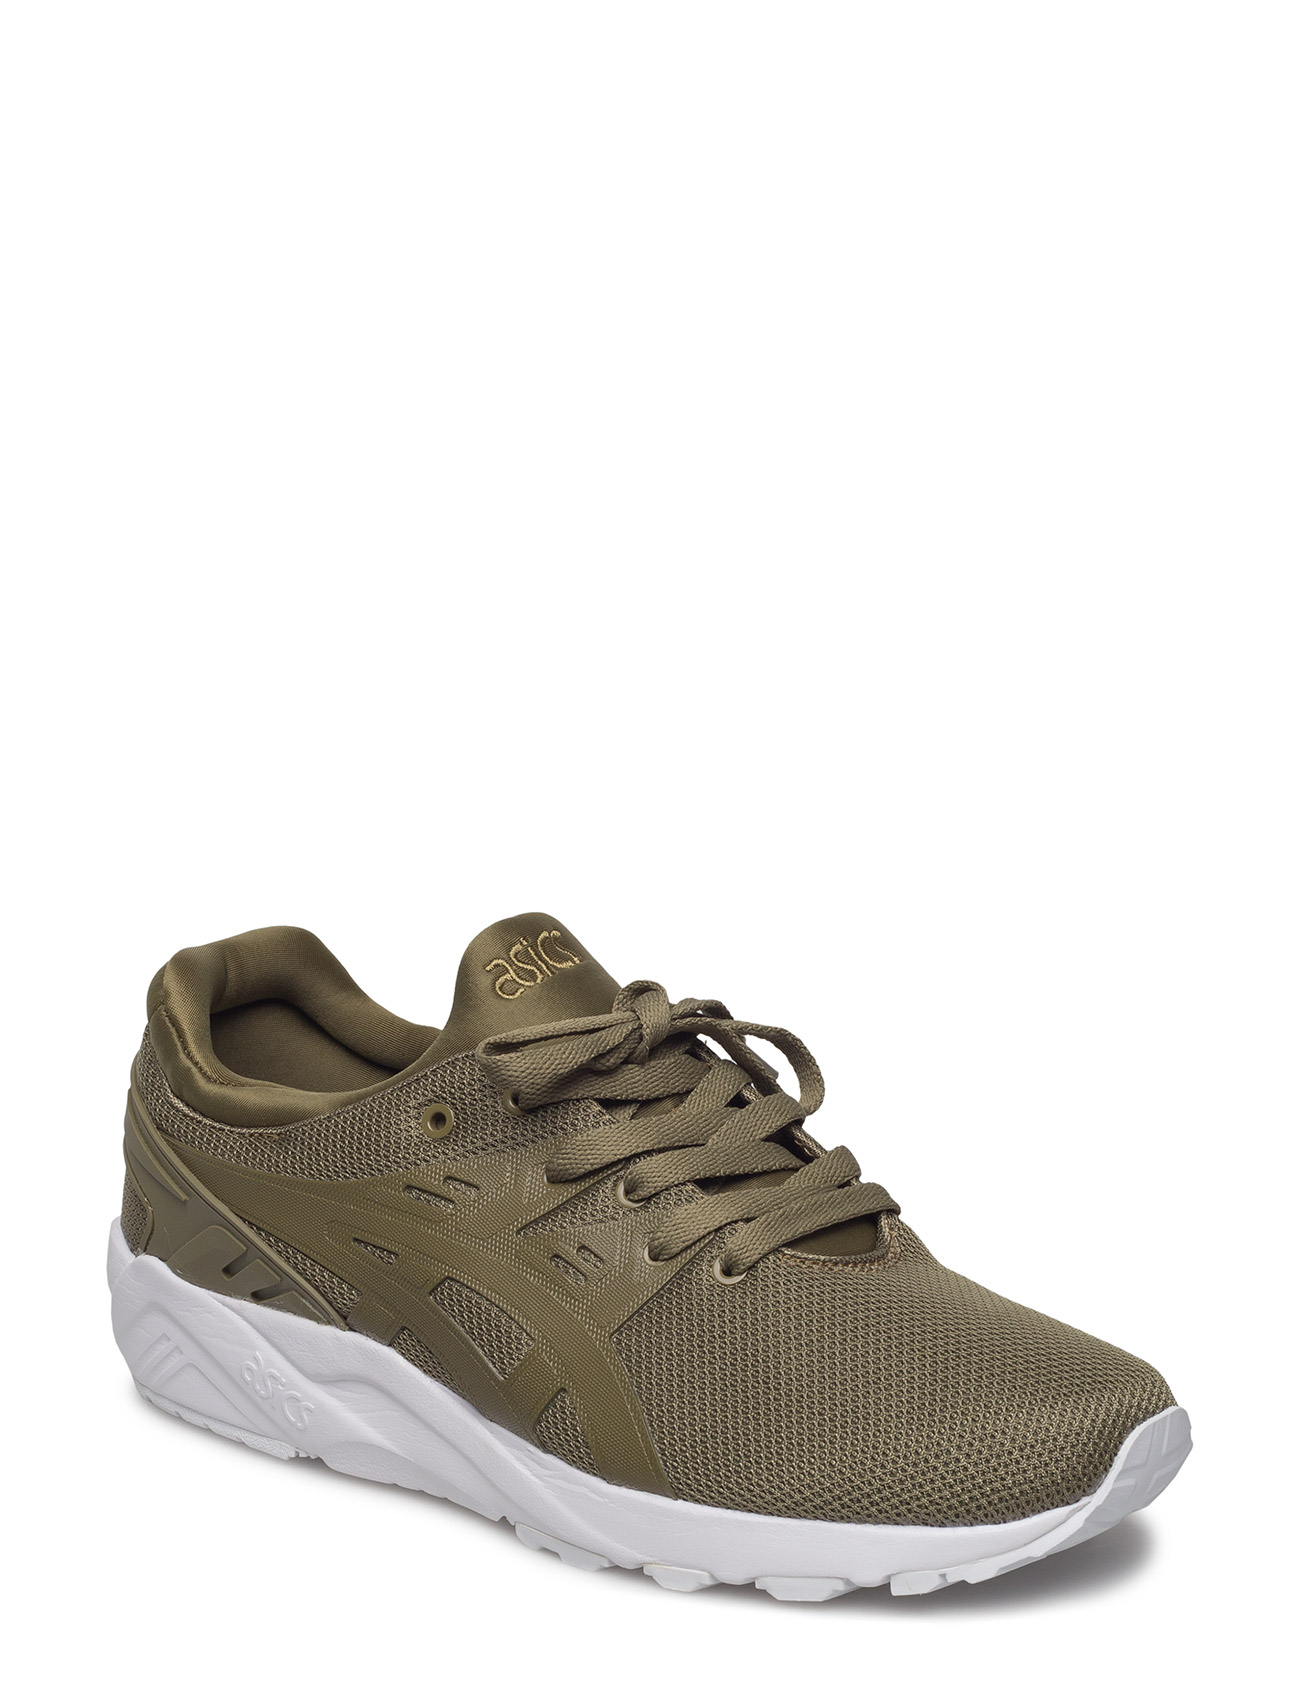 Gel-Kayano Trainer Evo Asics Sports sko til Herrer i